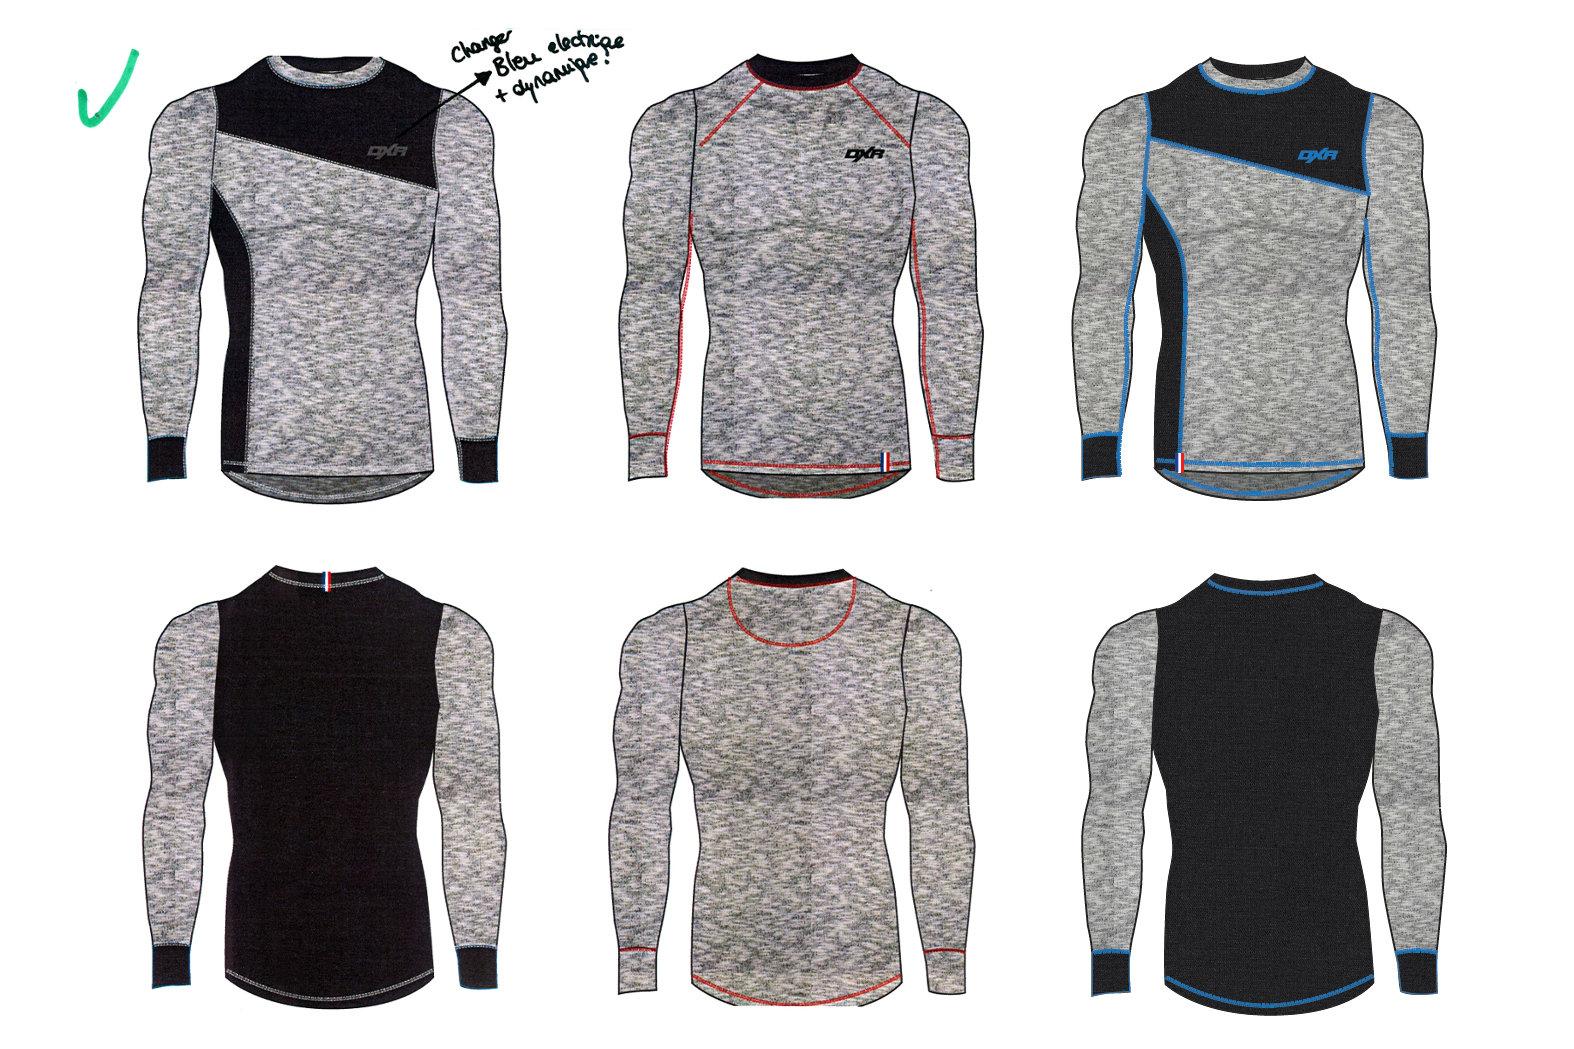 Style DXR Vaillant